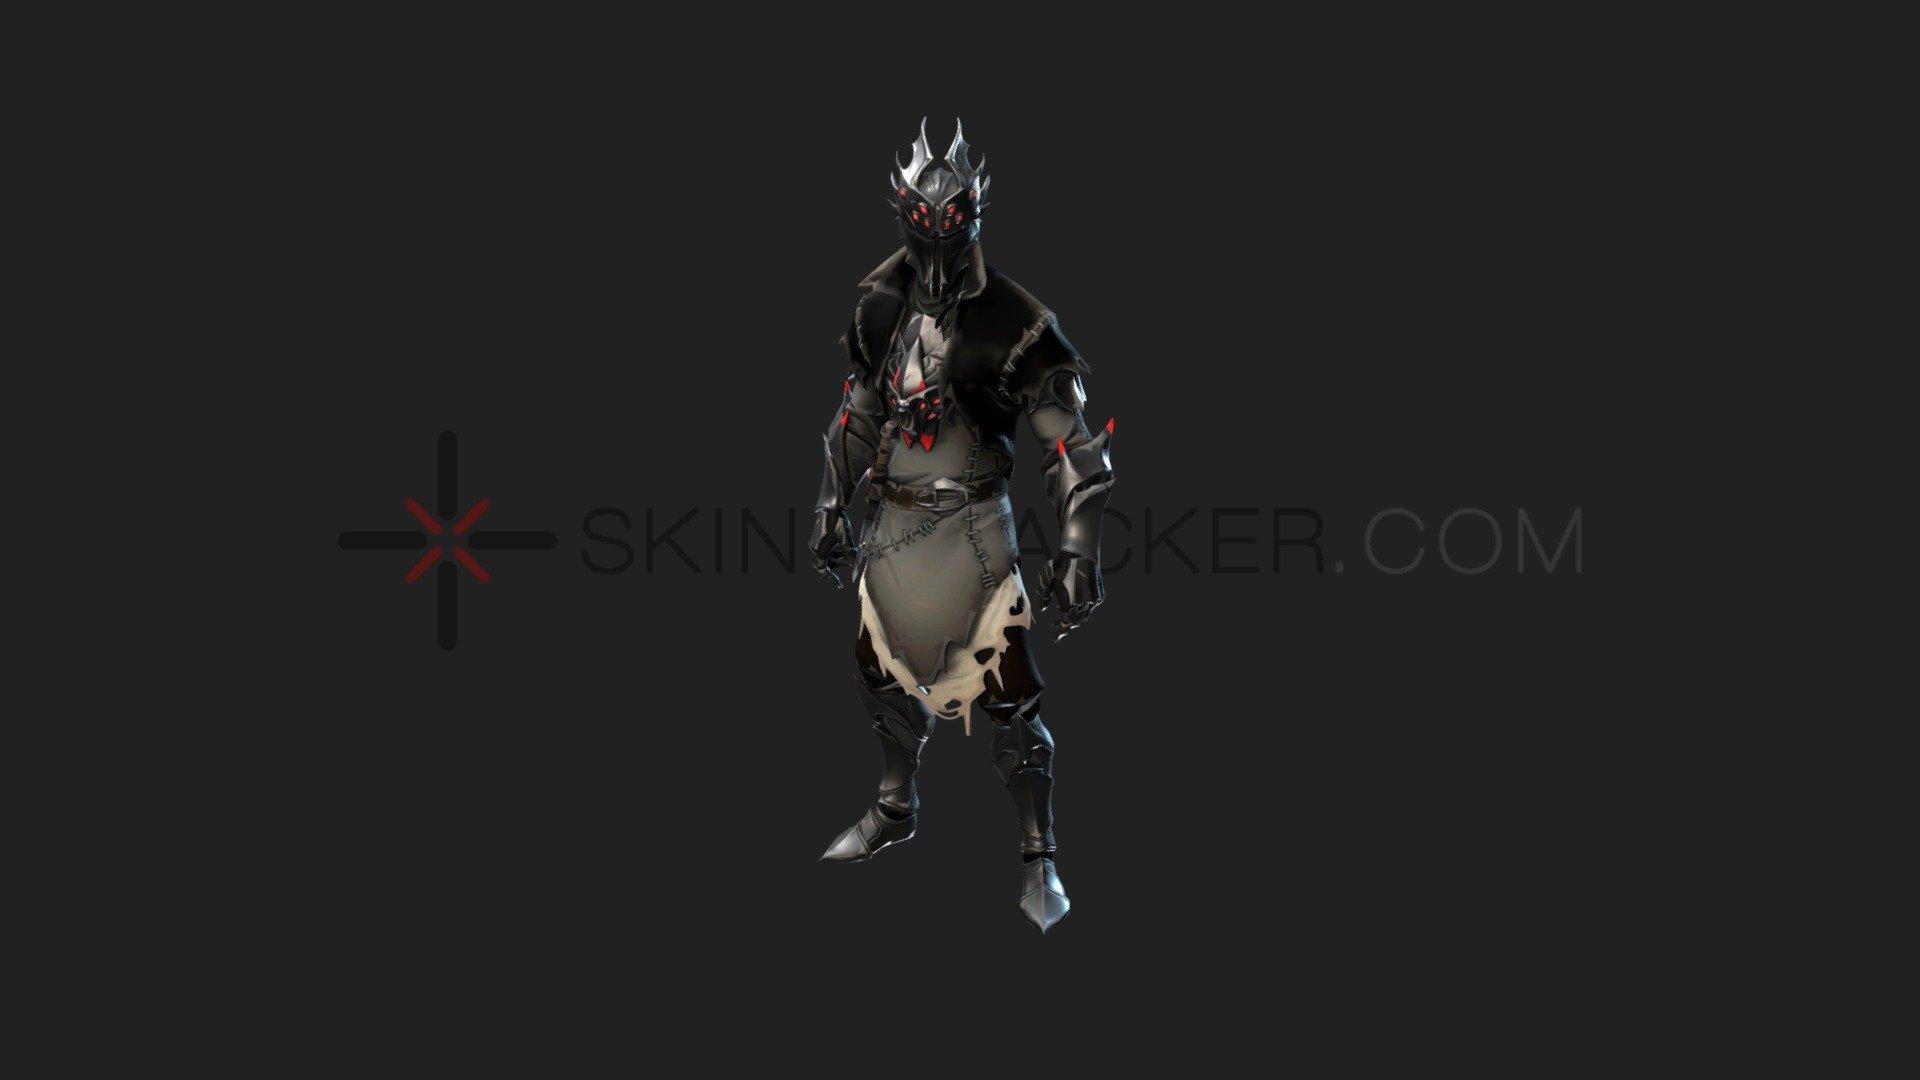 Fortnite Spider Knight 3d Model By Skin Tracker